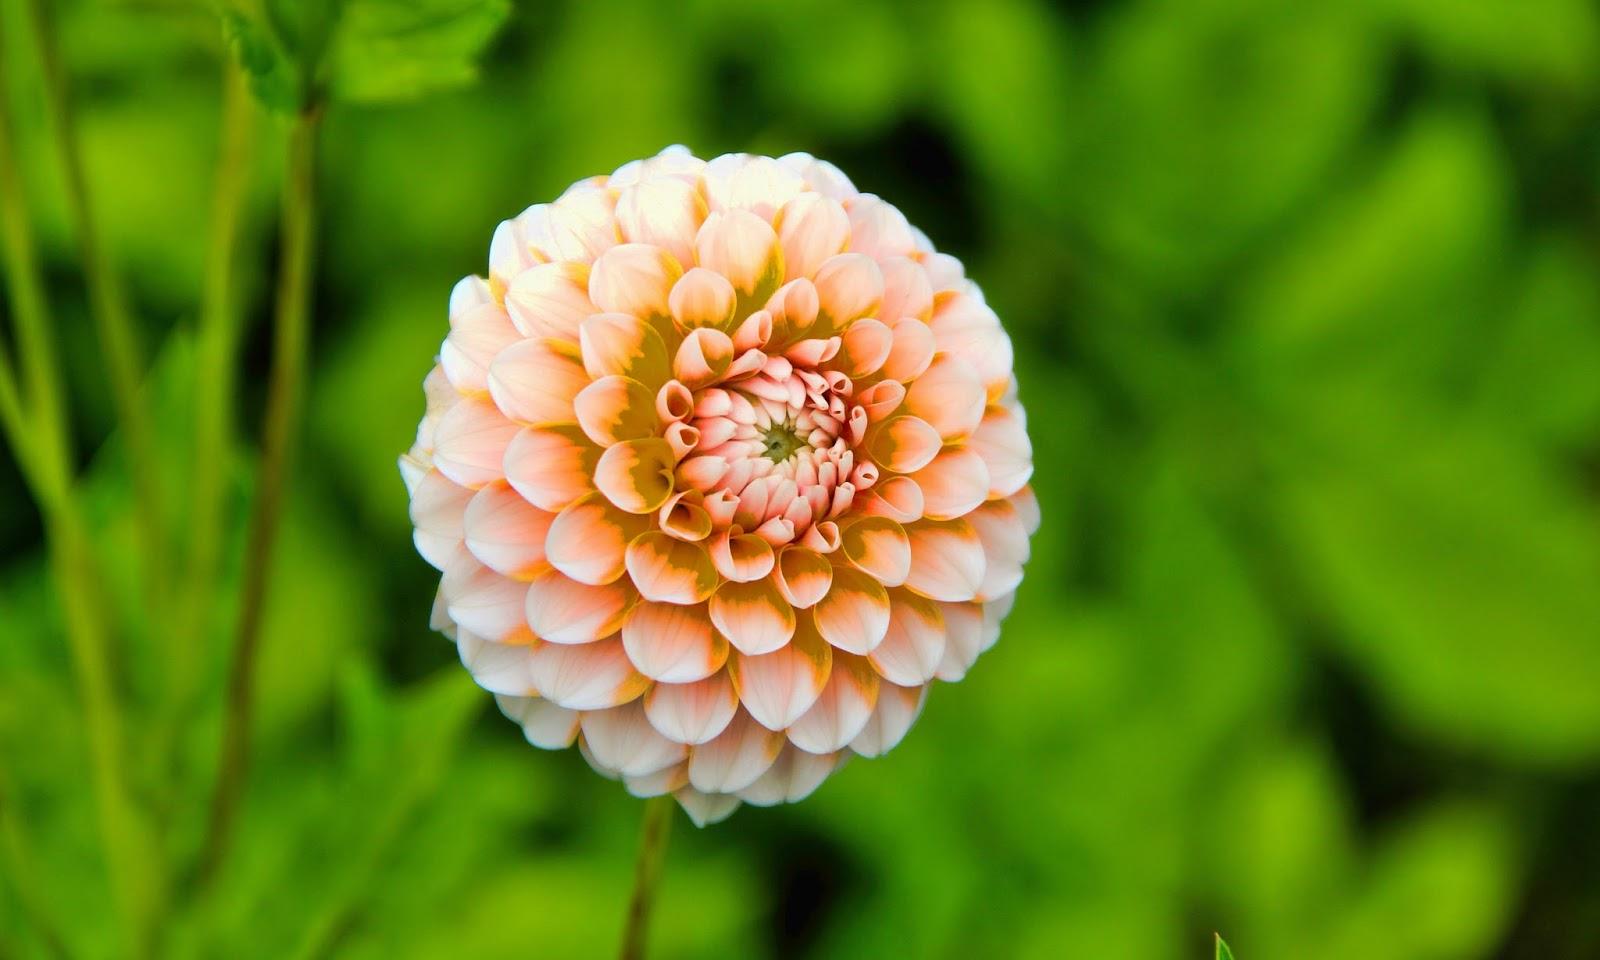 Dahlia Flower HD Wallpapers